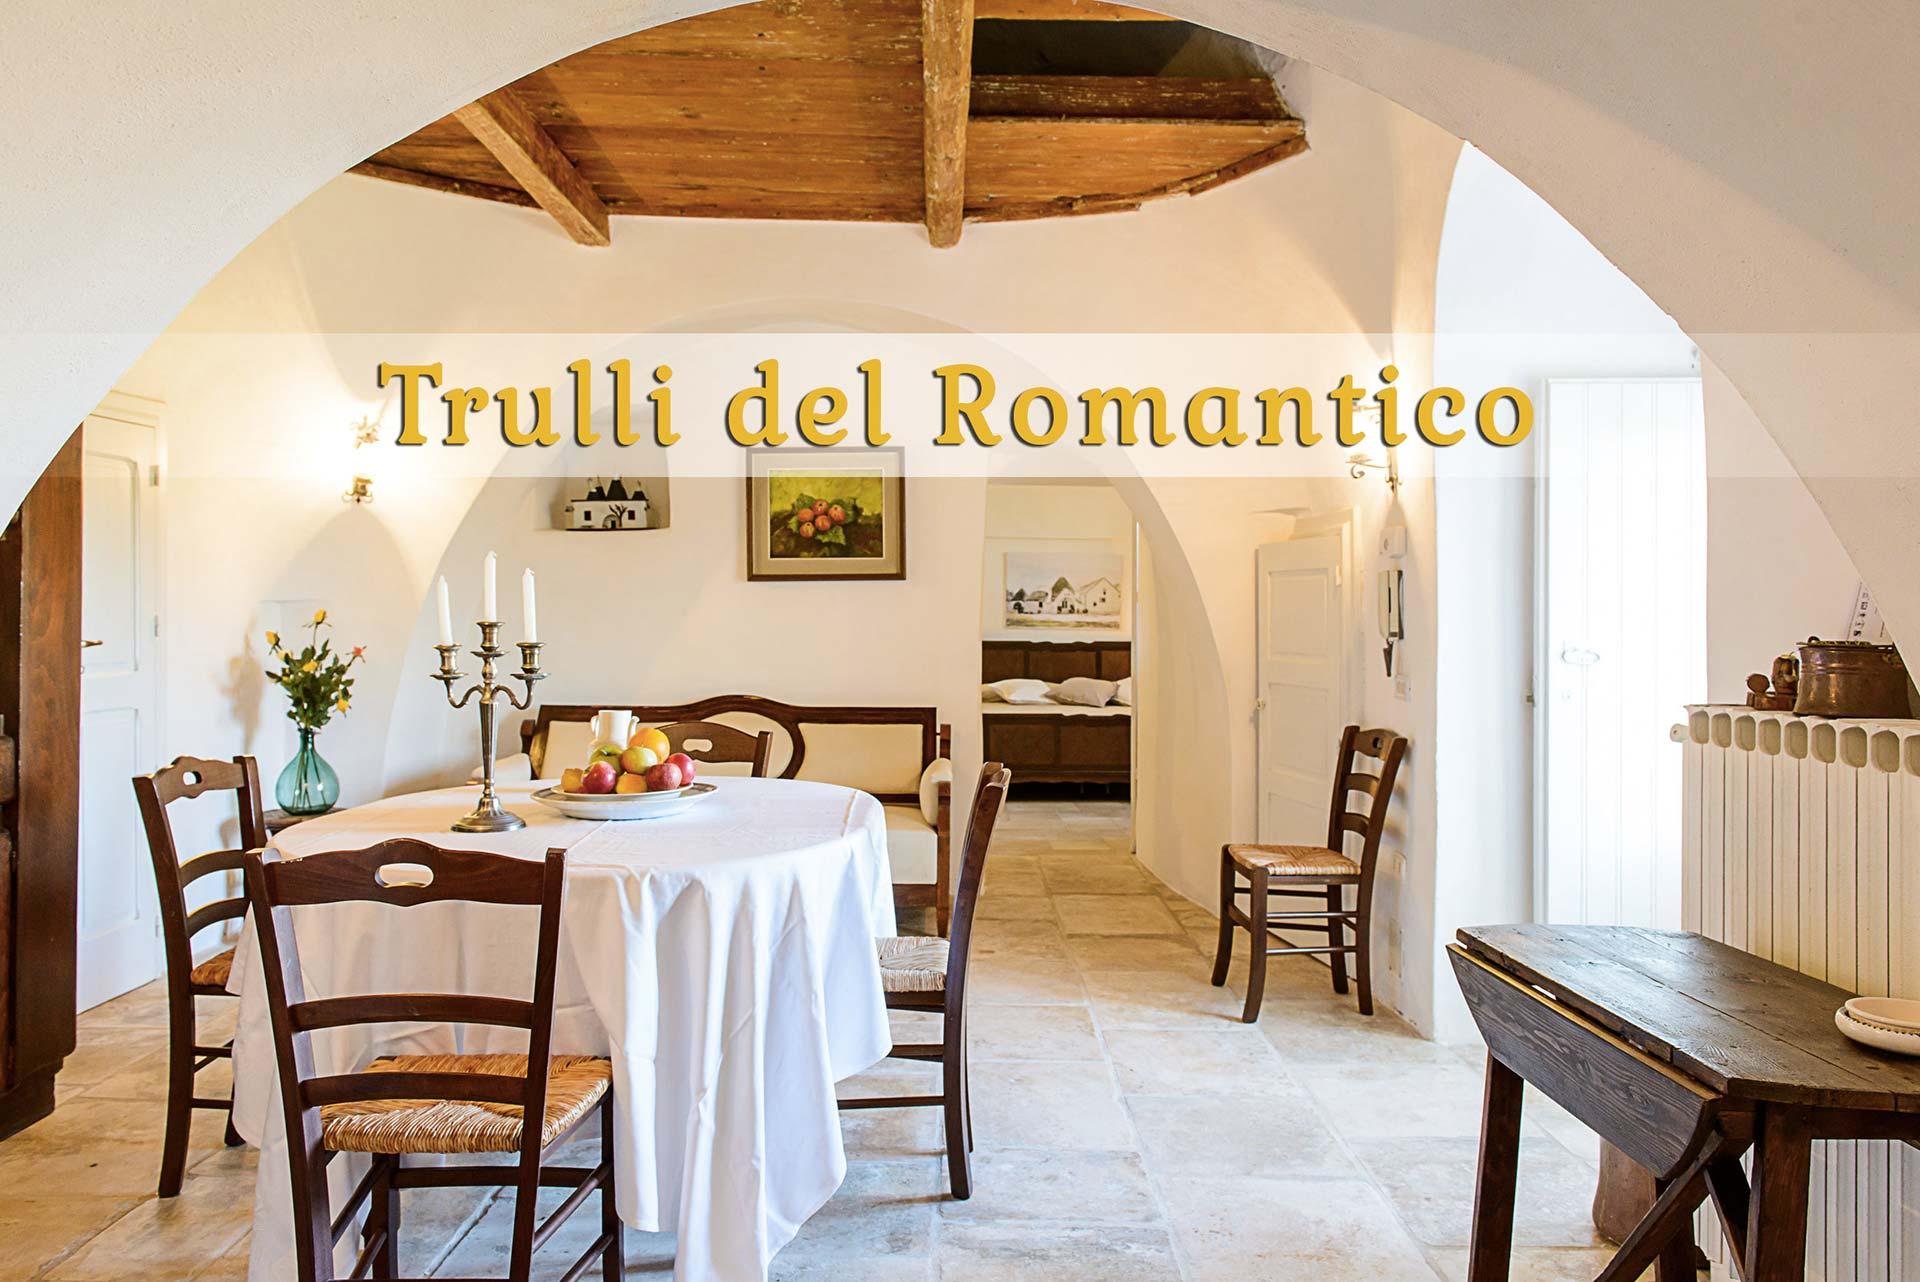 Trulli del Romantico | B&B Martina Franca